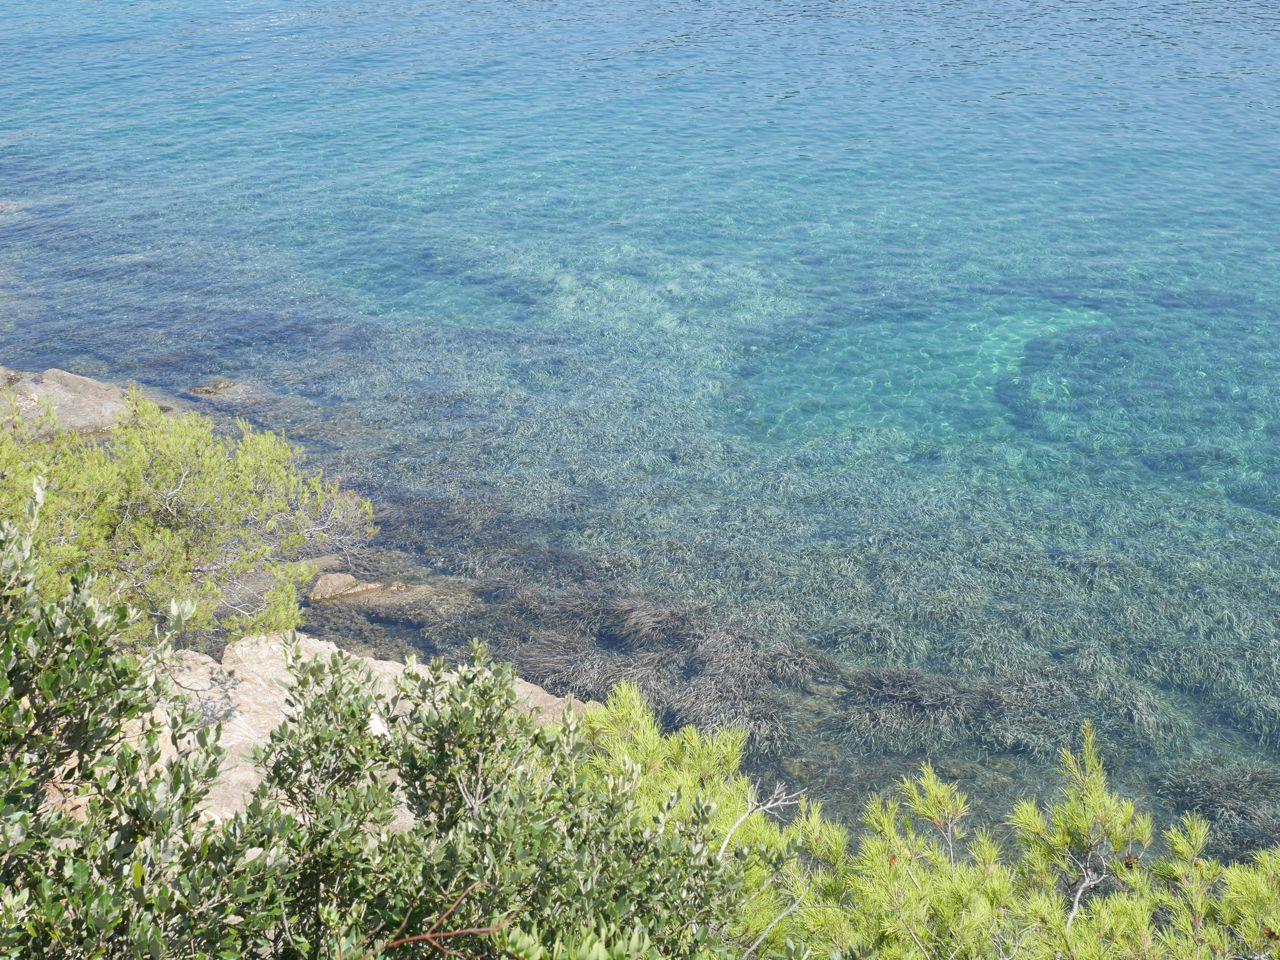 Herbiers de Posidonie - Port Cros